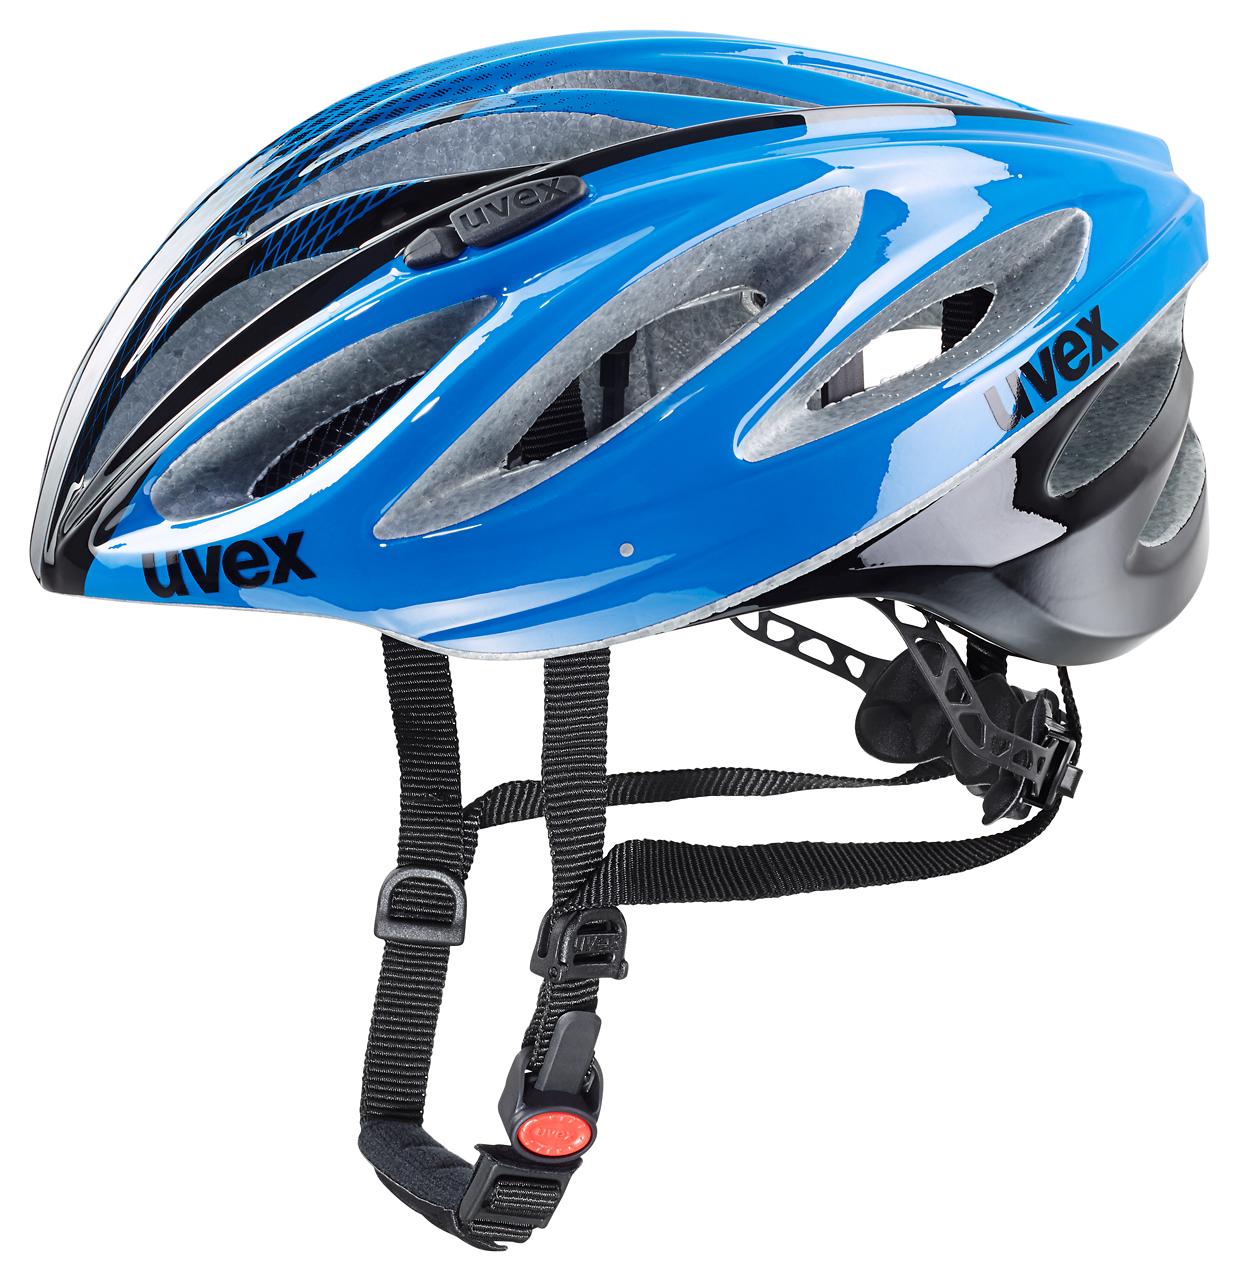 UVEX BOSS RACE, BLUE-BLACK 2016 52-56 cm